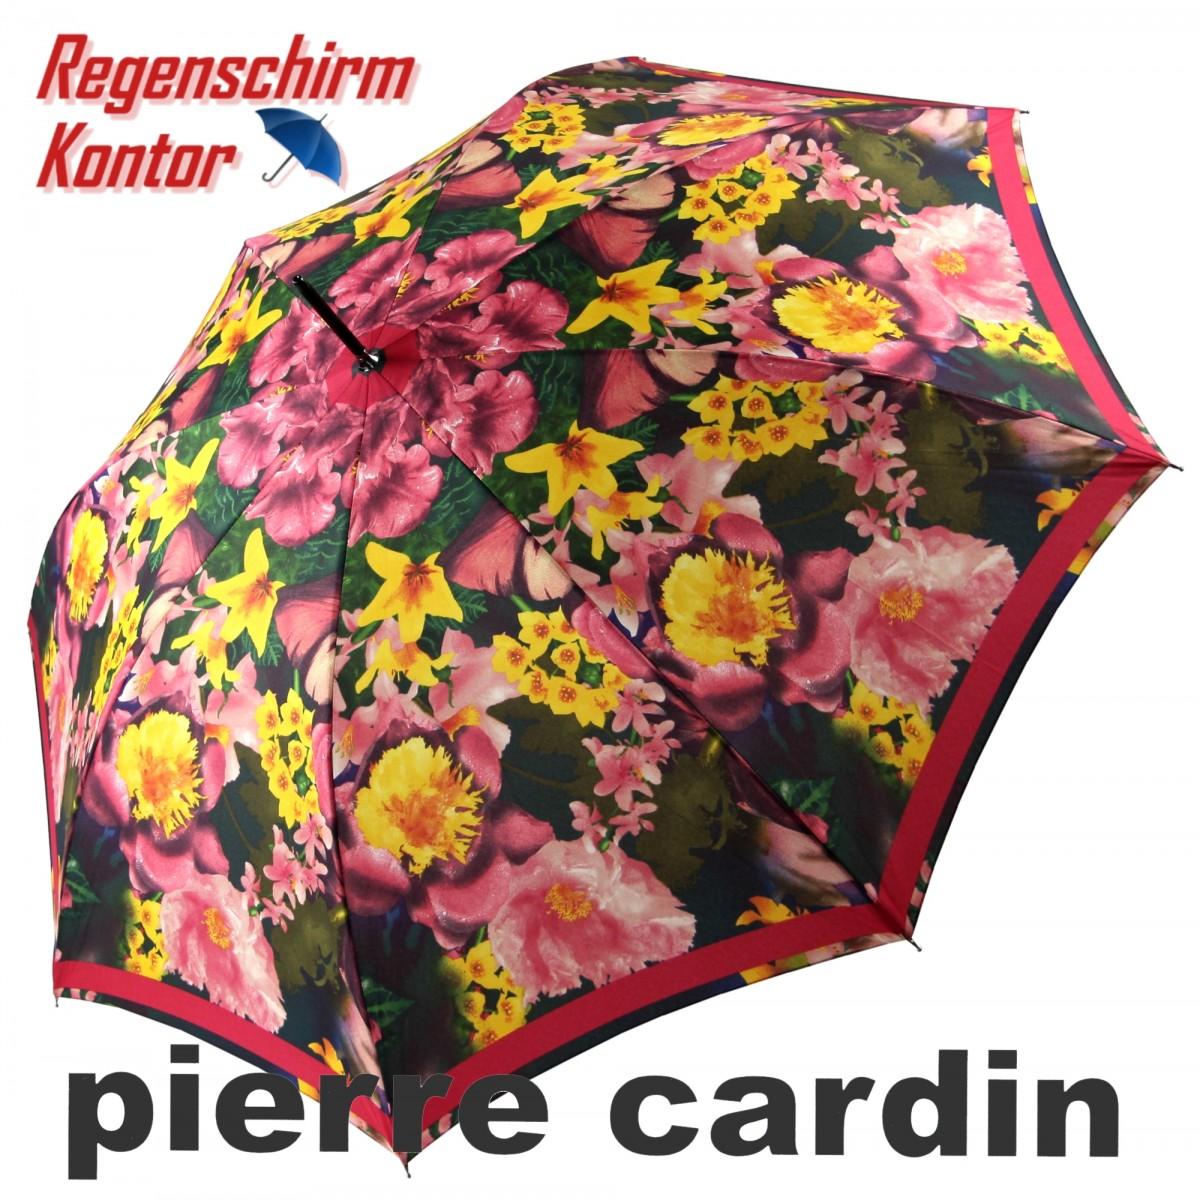 Pierre Cardin Stockschirm Automatik Damen Blumen